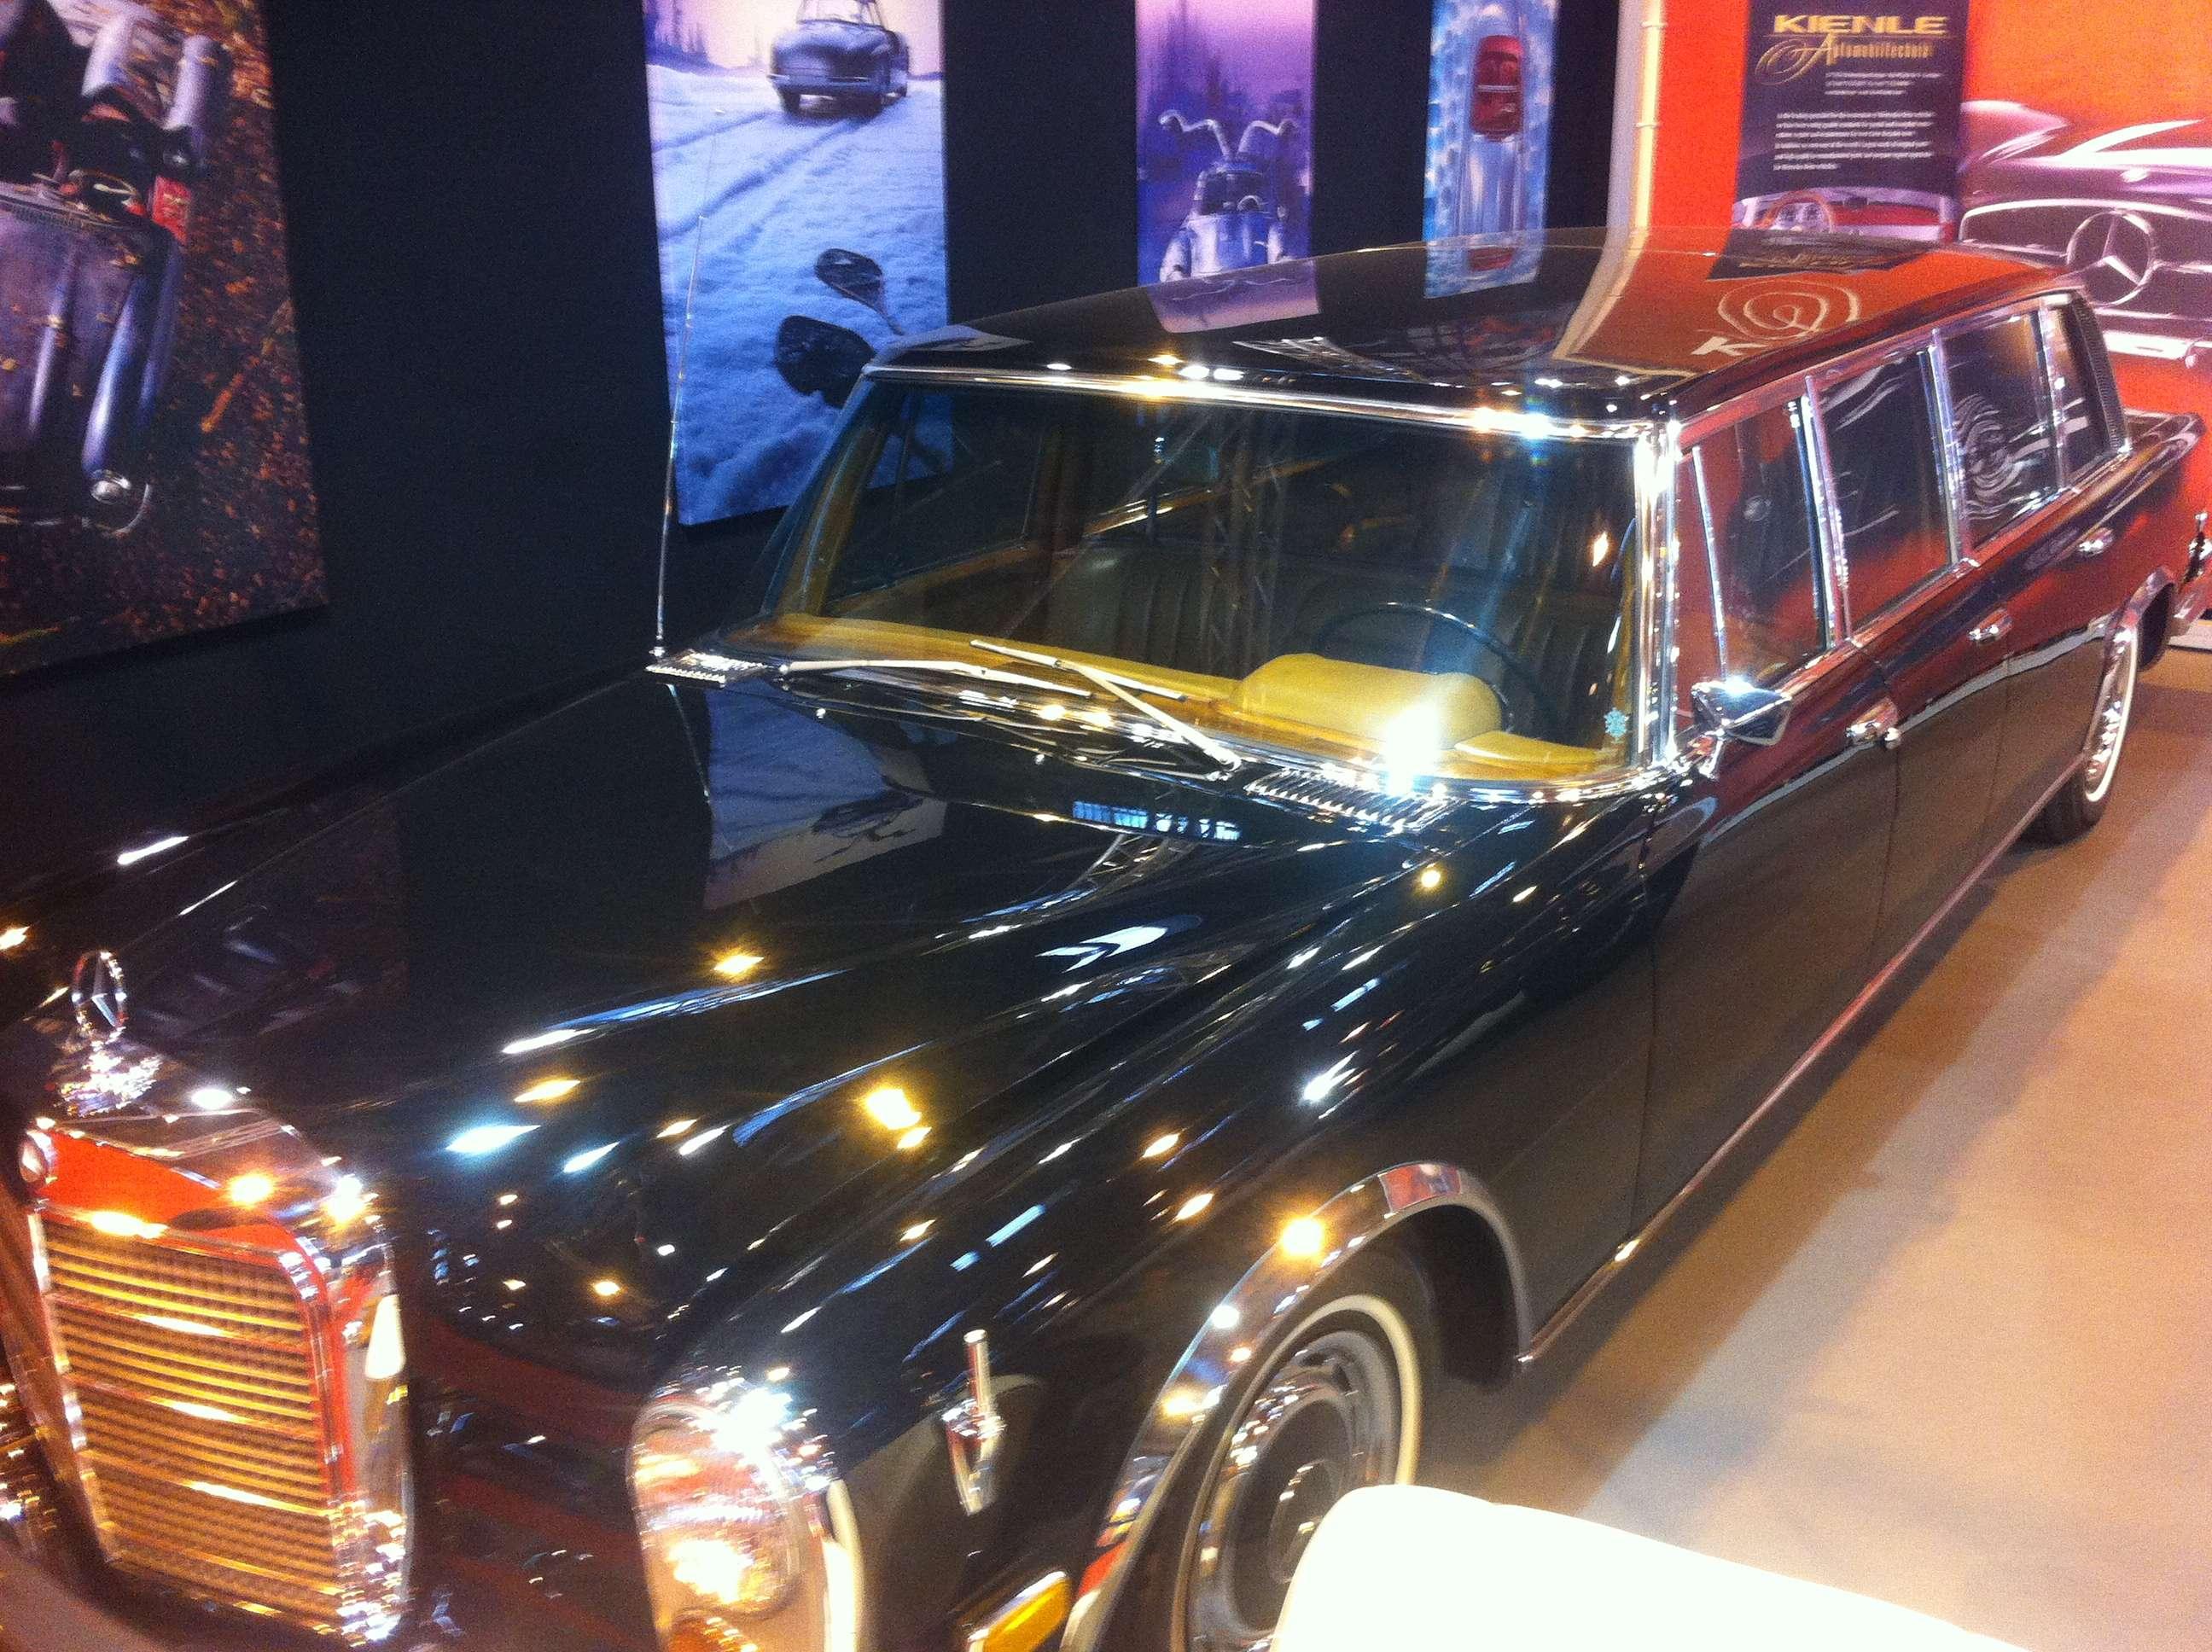 Mercedes-Benz 600 Pullman, precursorul màrcii Maybach, a fost cumpàrat de Papi si celebritàti precum Elizabeth Taylor, Coco Chanel si John Lennon